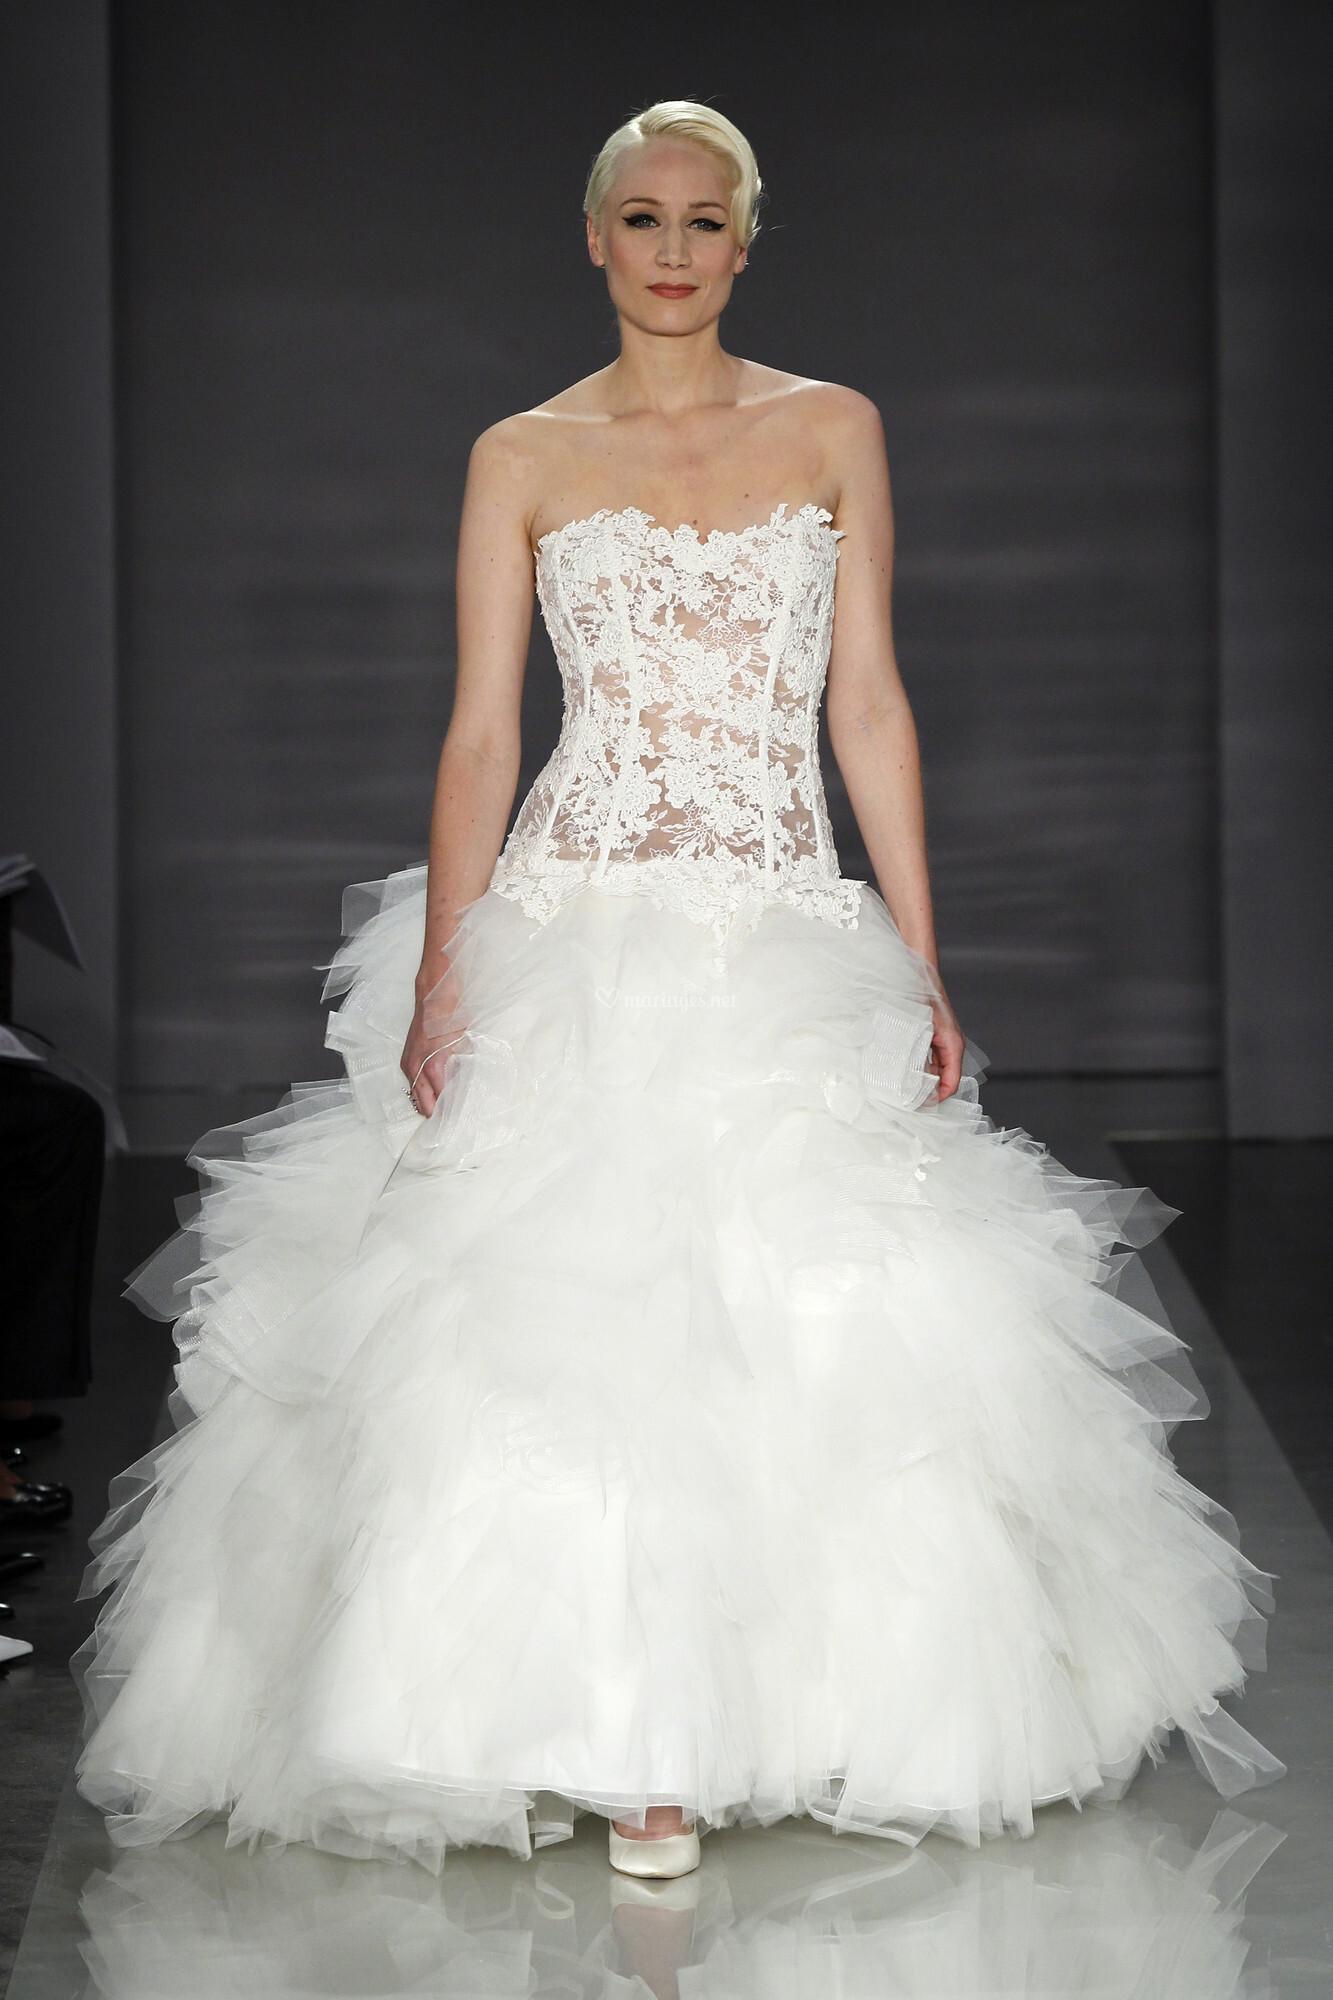 HOLLY - Robes de mariée - Cymbeline - Mariages.net